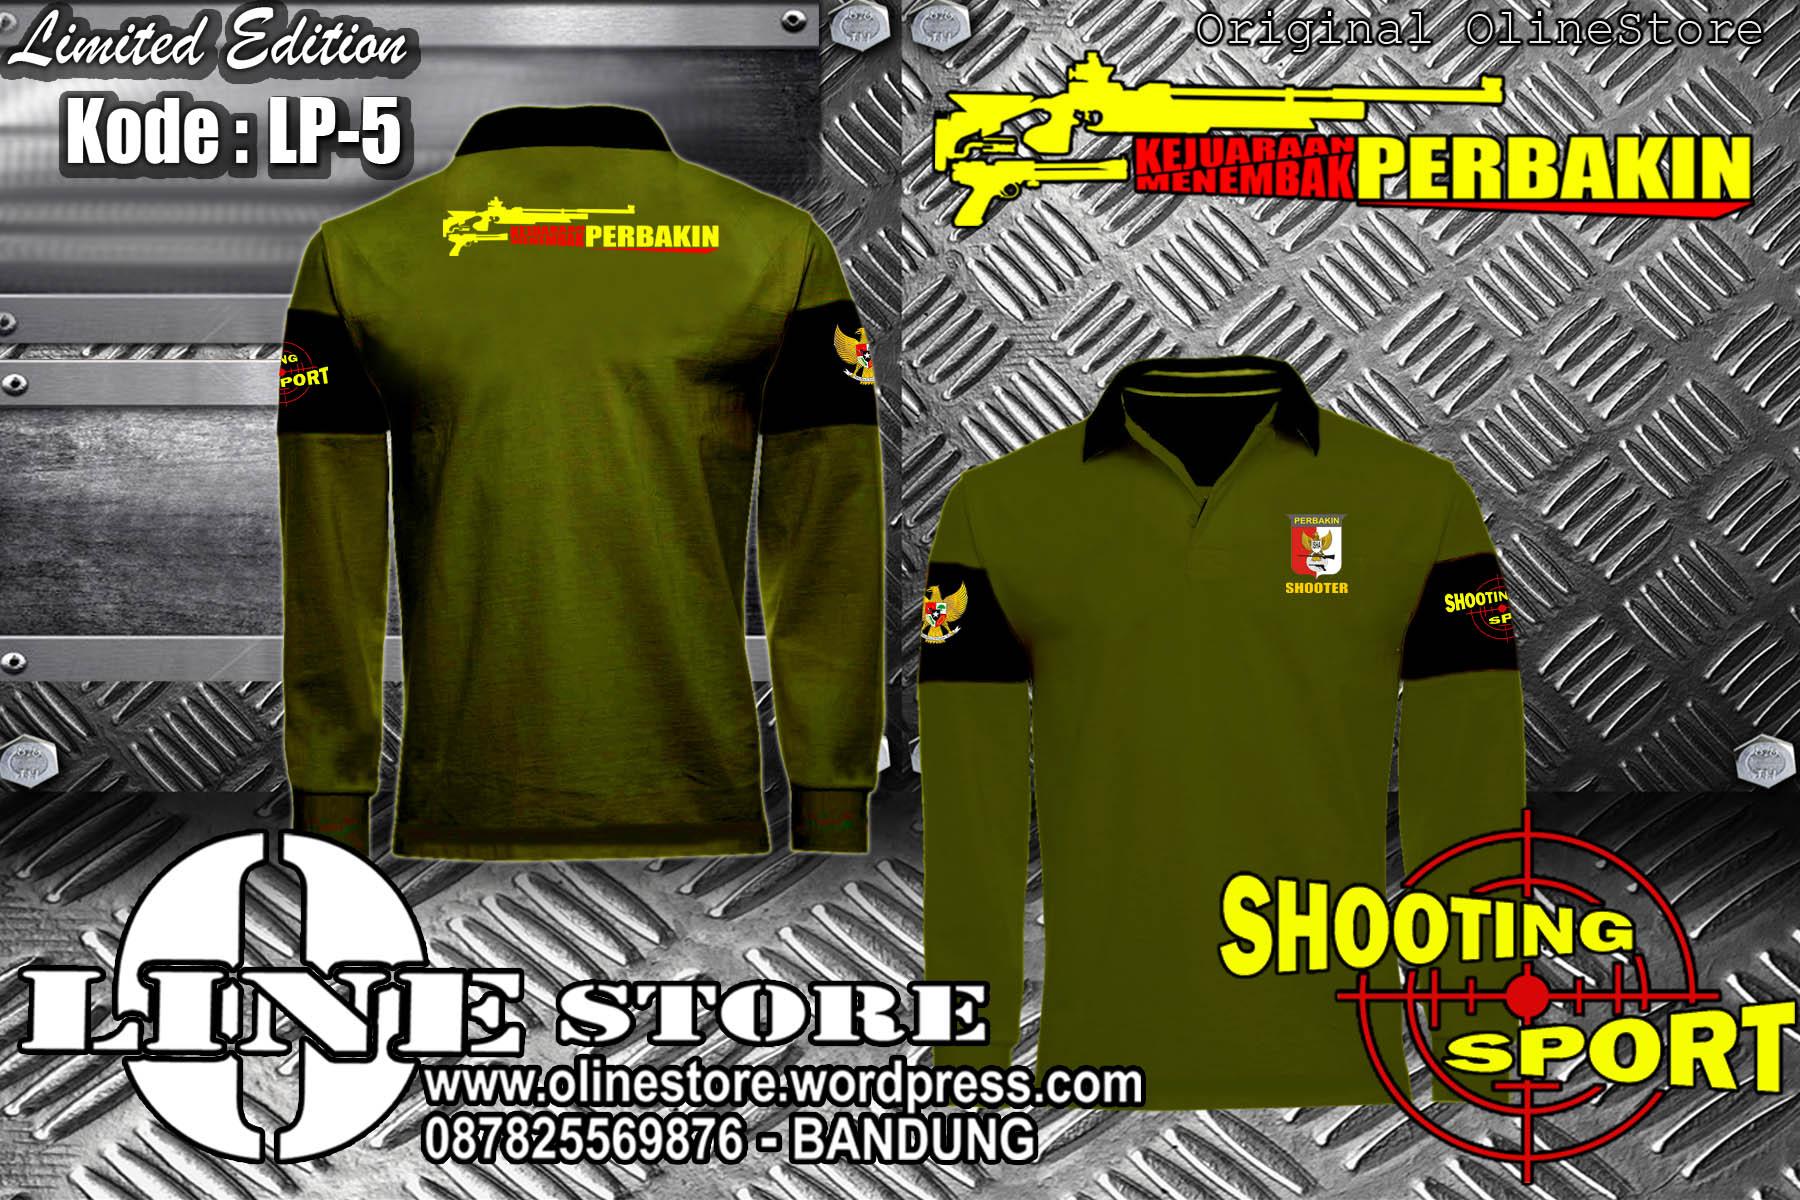 Lp 5 Polo Shirt Perbakin Kejuaraan Menembak 6 Ready Stock Kaos Jual Baju Kemeja Jaket Poloshirt Katalog O Line Store Kode